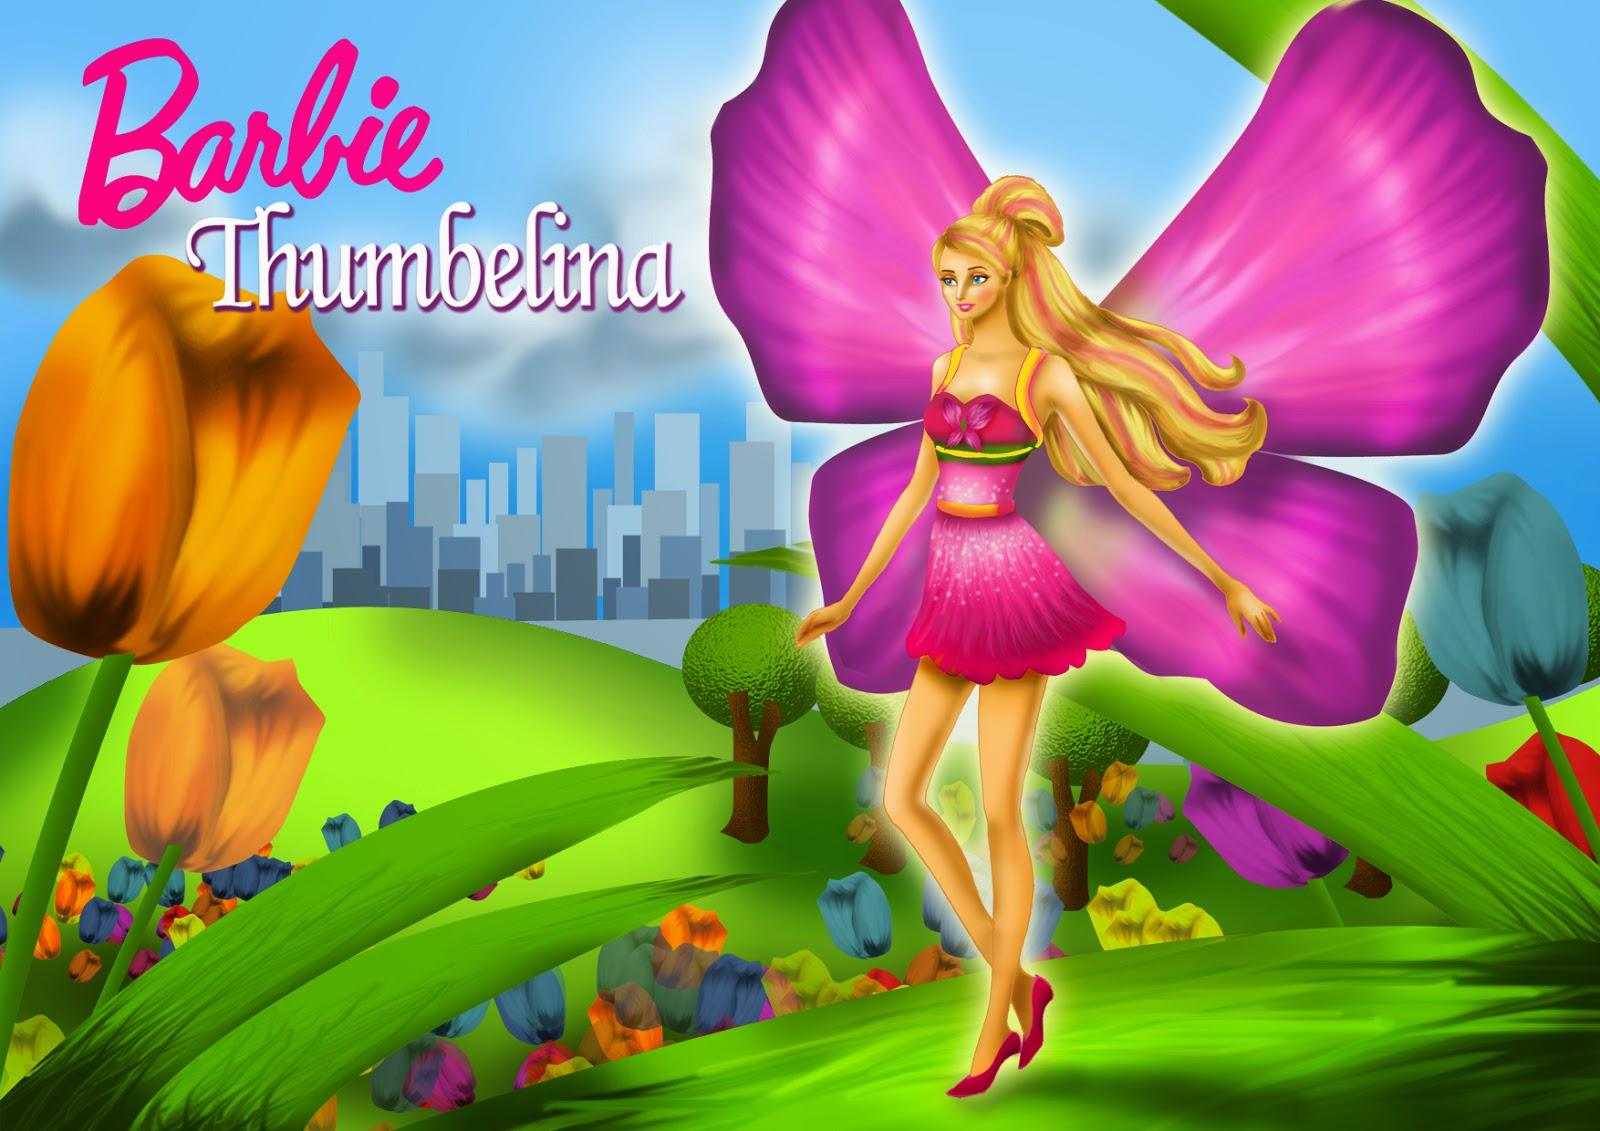 Gambar Barbie Thumbelina